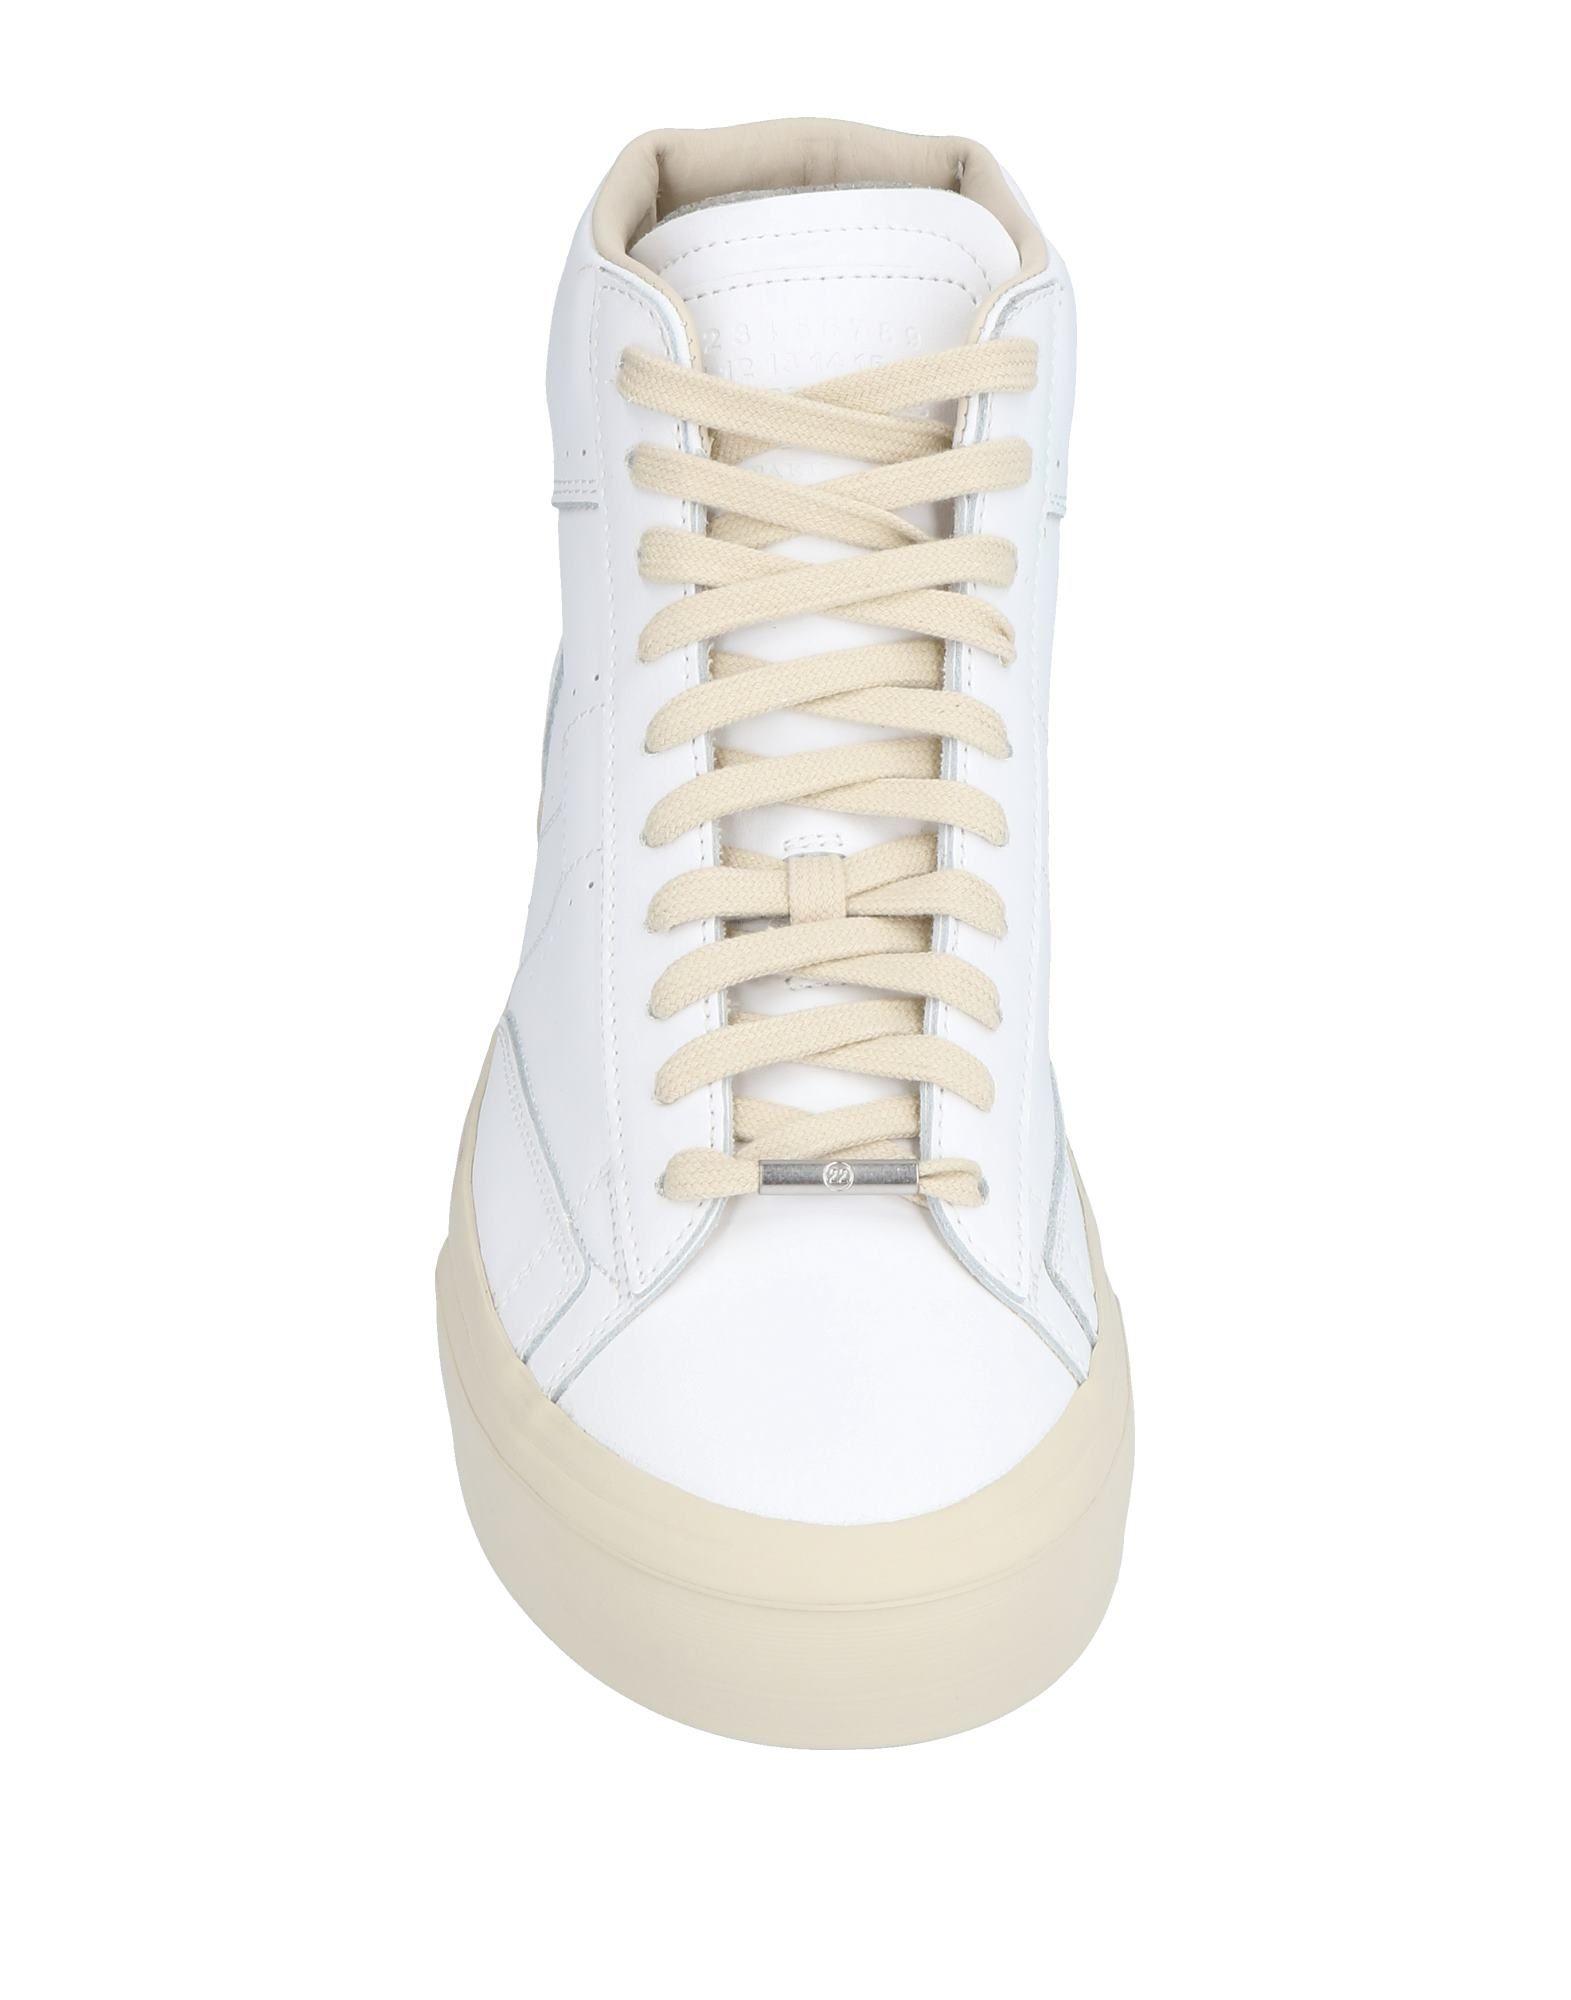 Maison Margiela Sneakers Herren  11471907NS 11471907NS 11471907NS 94e77e